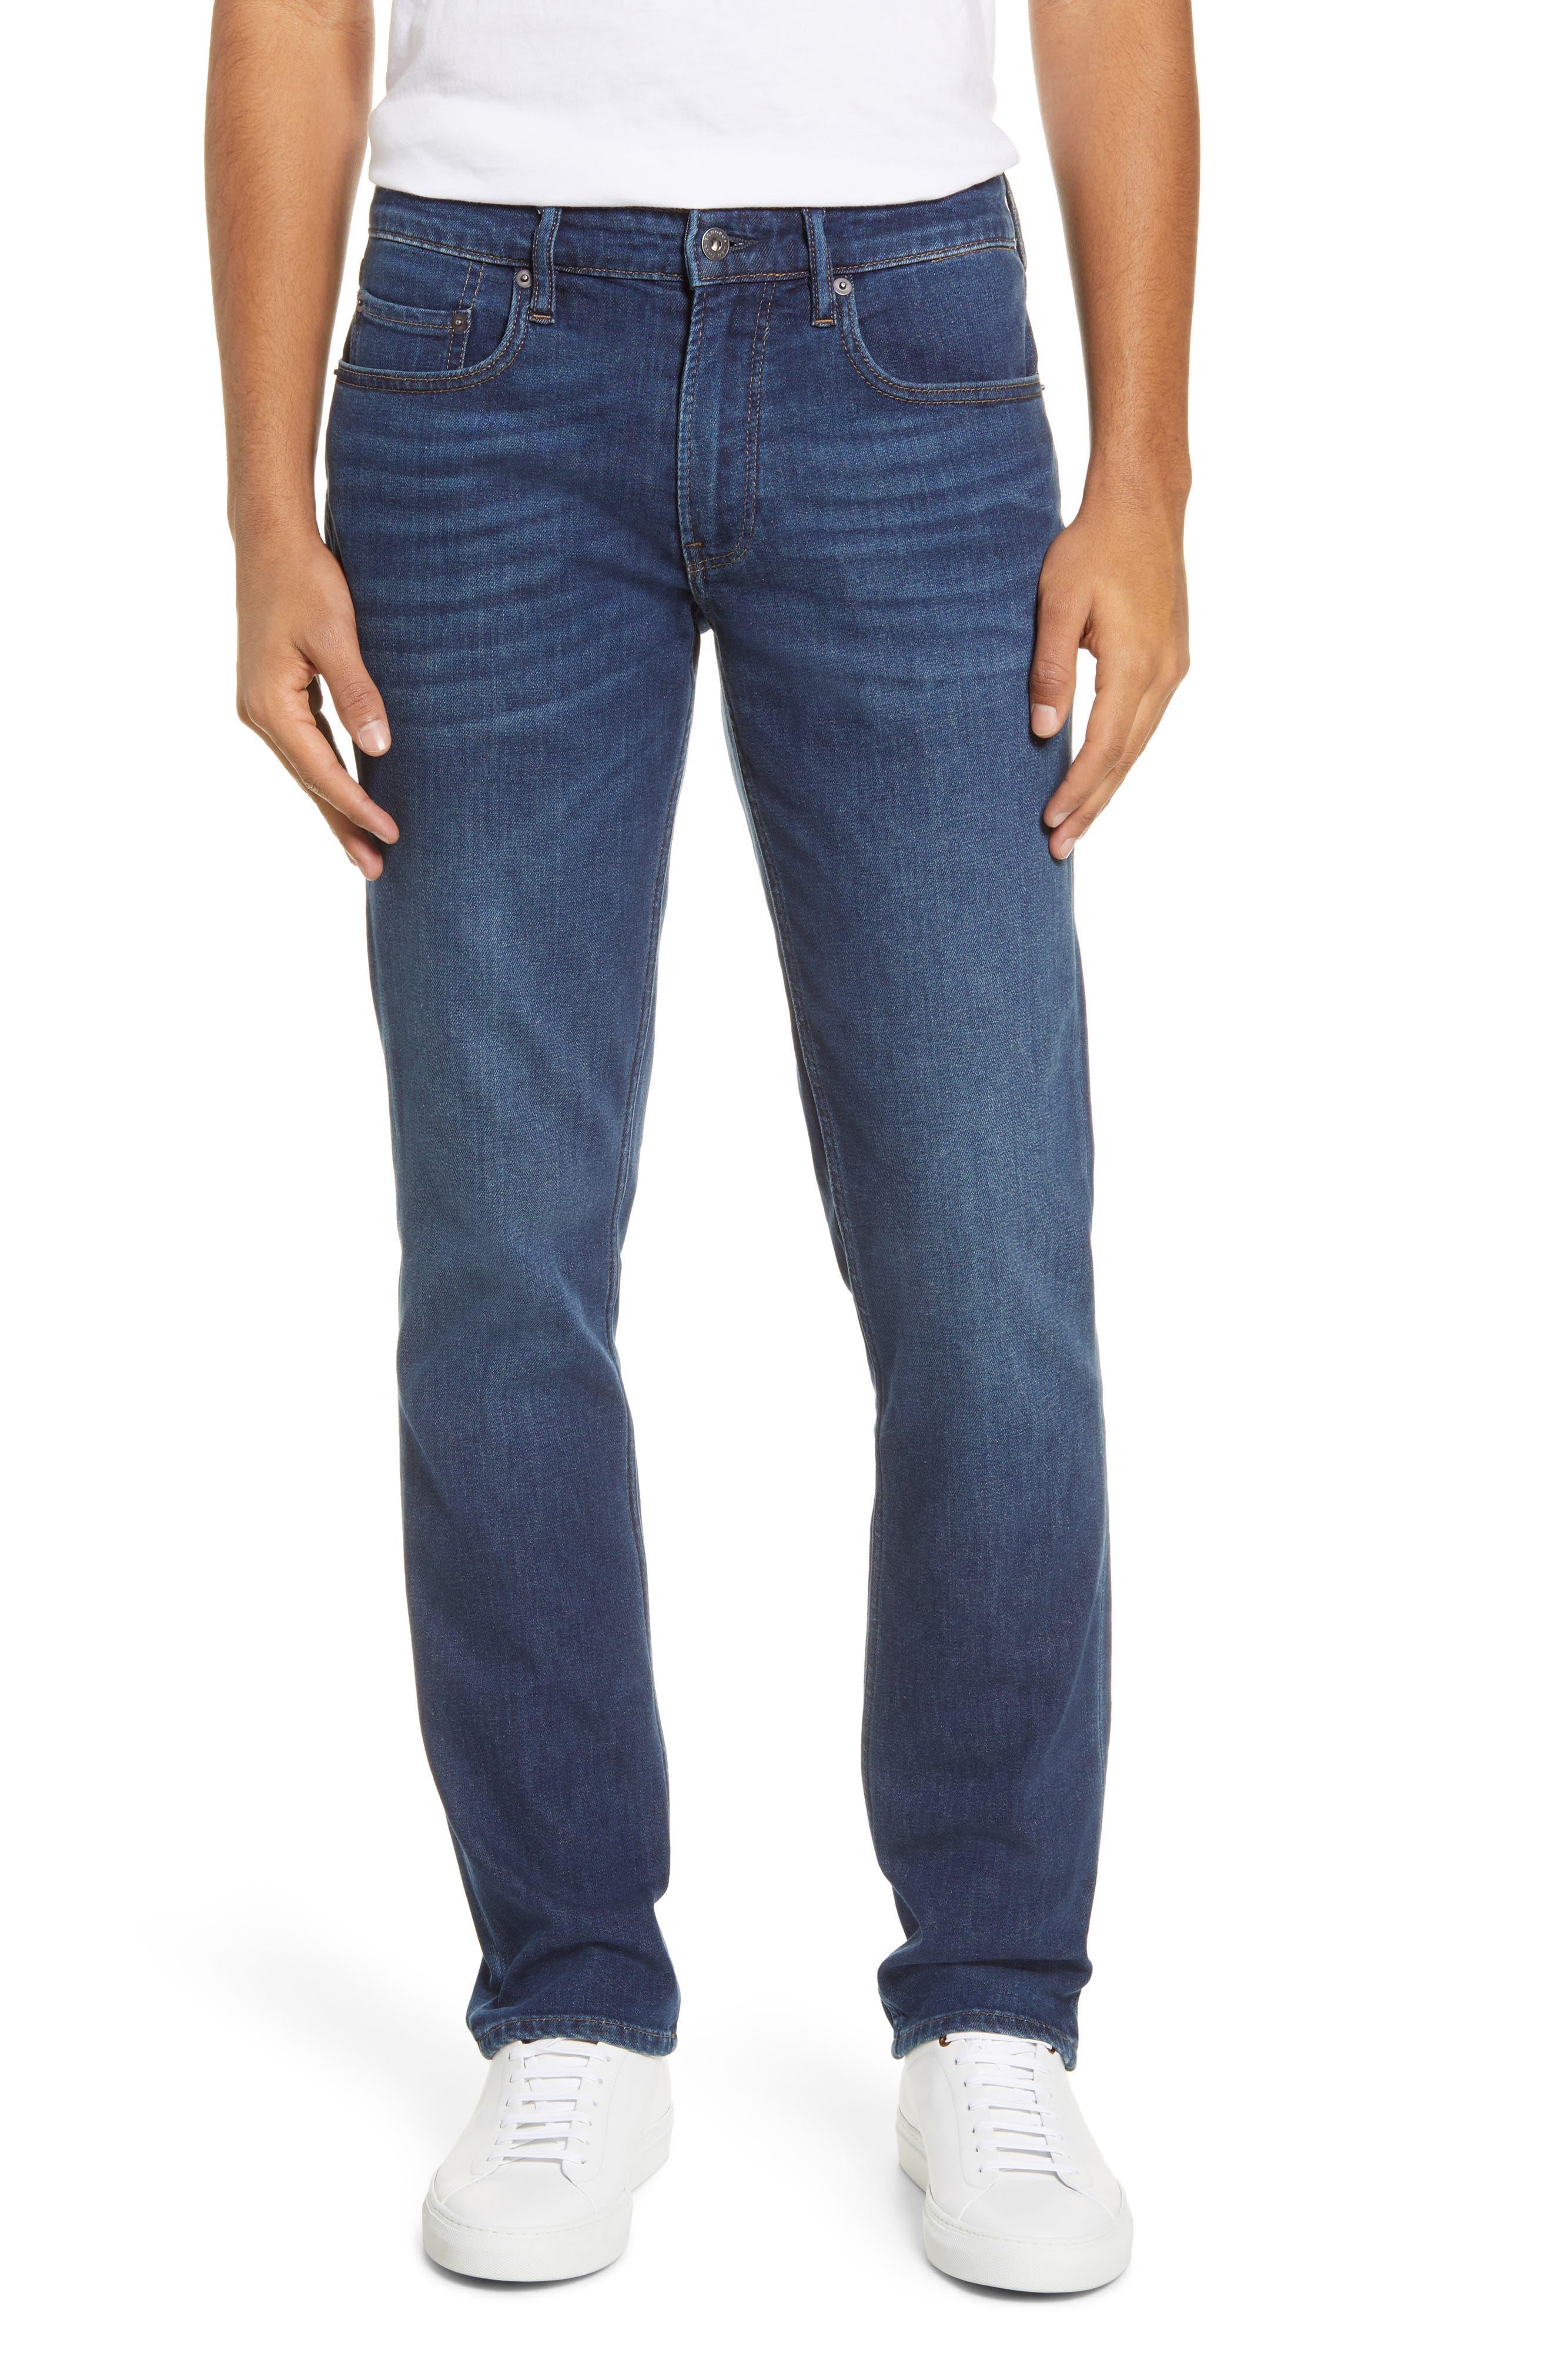 Men's Bonobos Lightweight Slim Fit Jeans,  29 x 32 - Blue